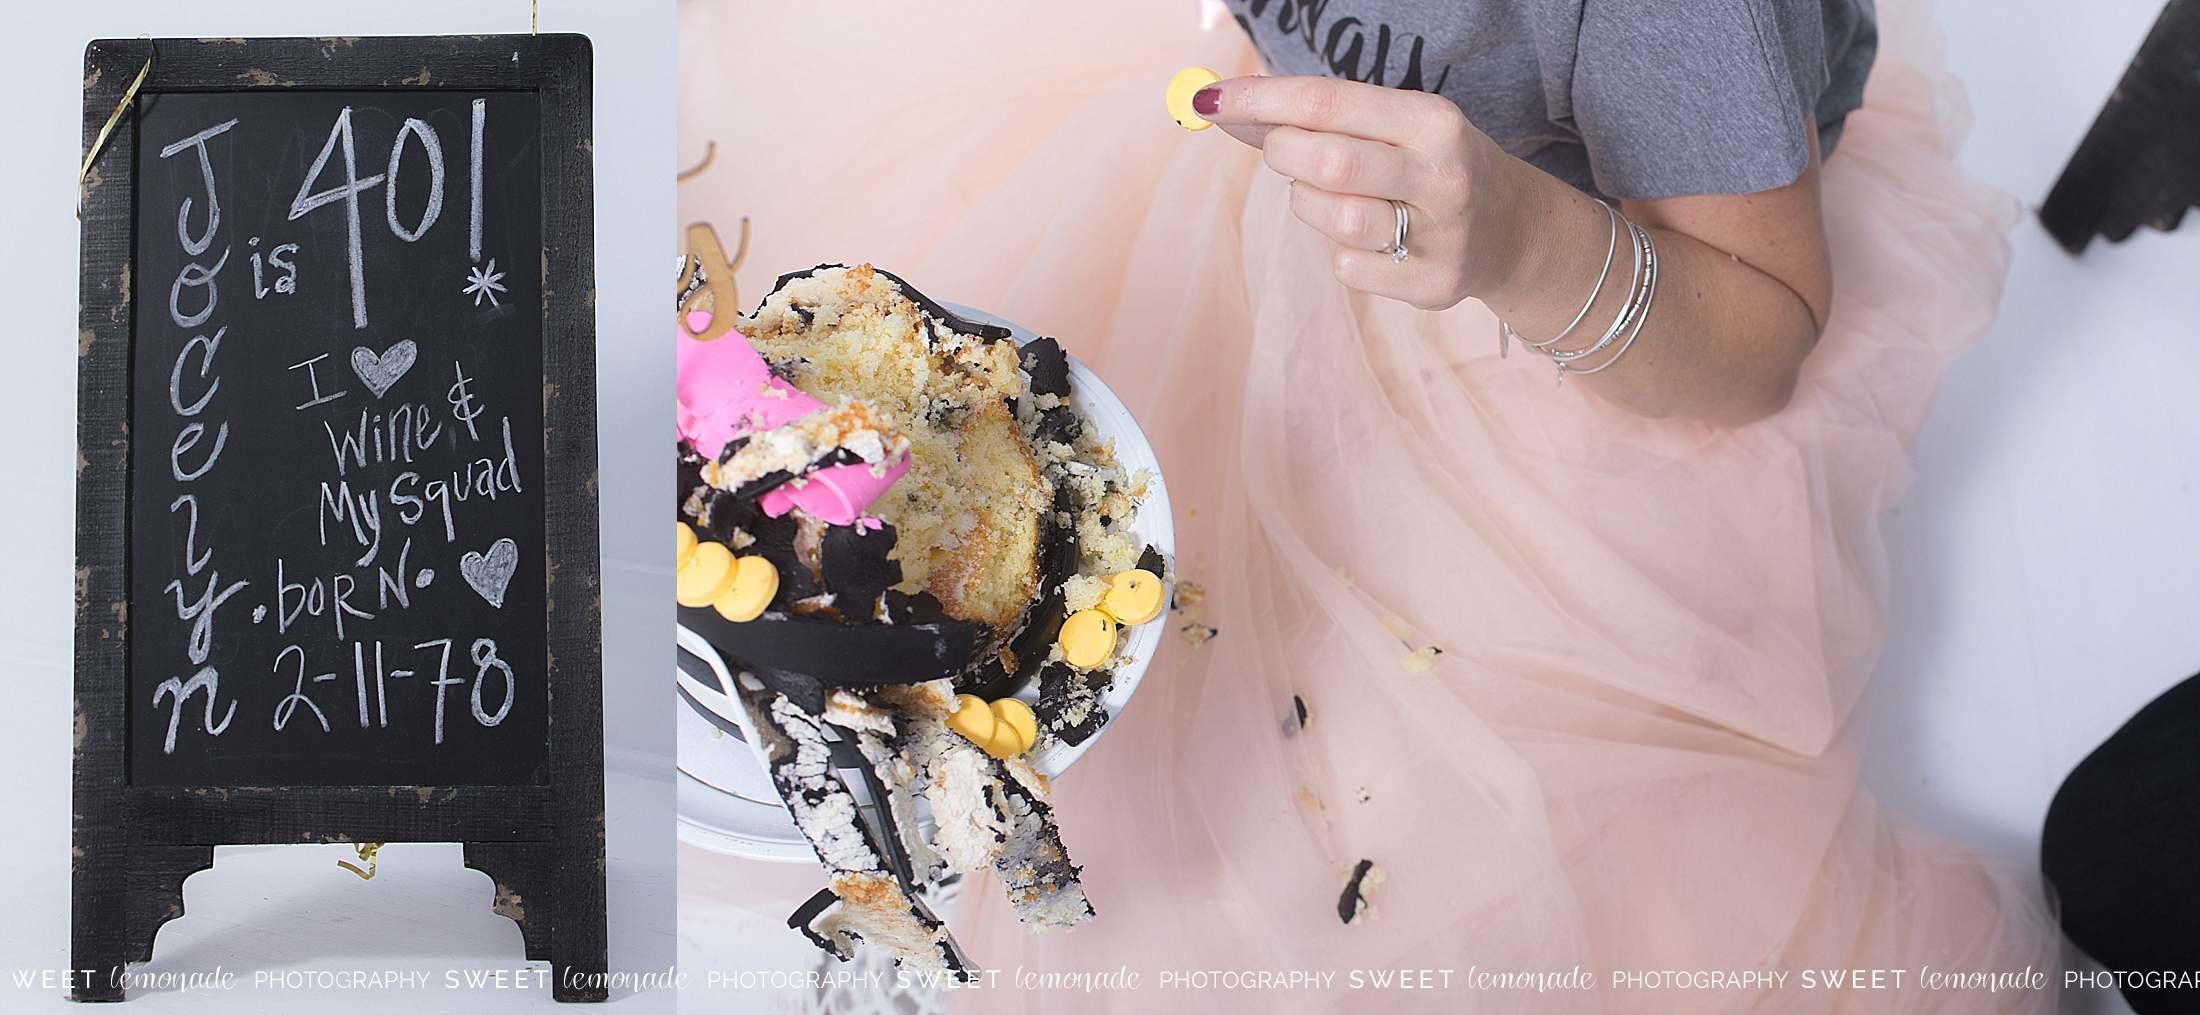 40-year-old-woman-cake-smash-chalkboard_1920.jpg